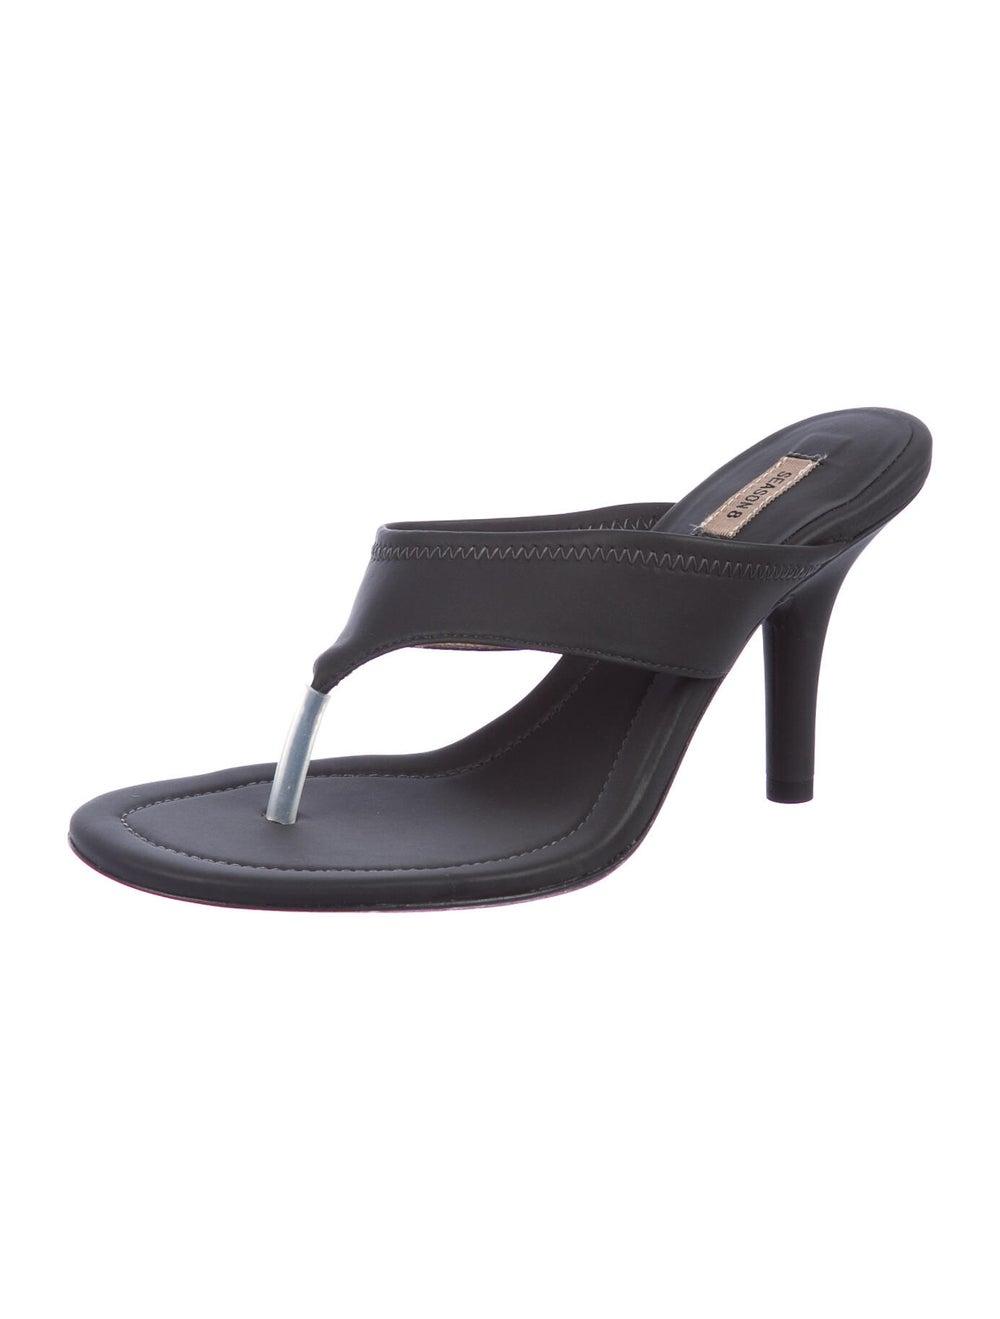 Yeezy T-Strap Sandals Grey - image 2